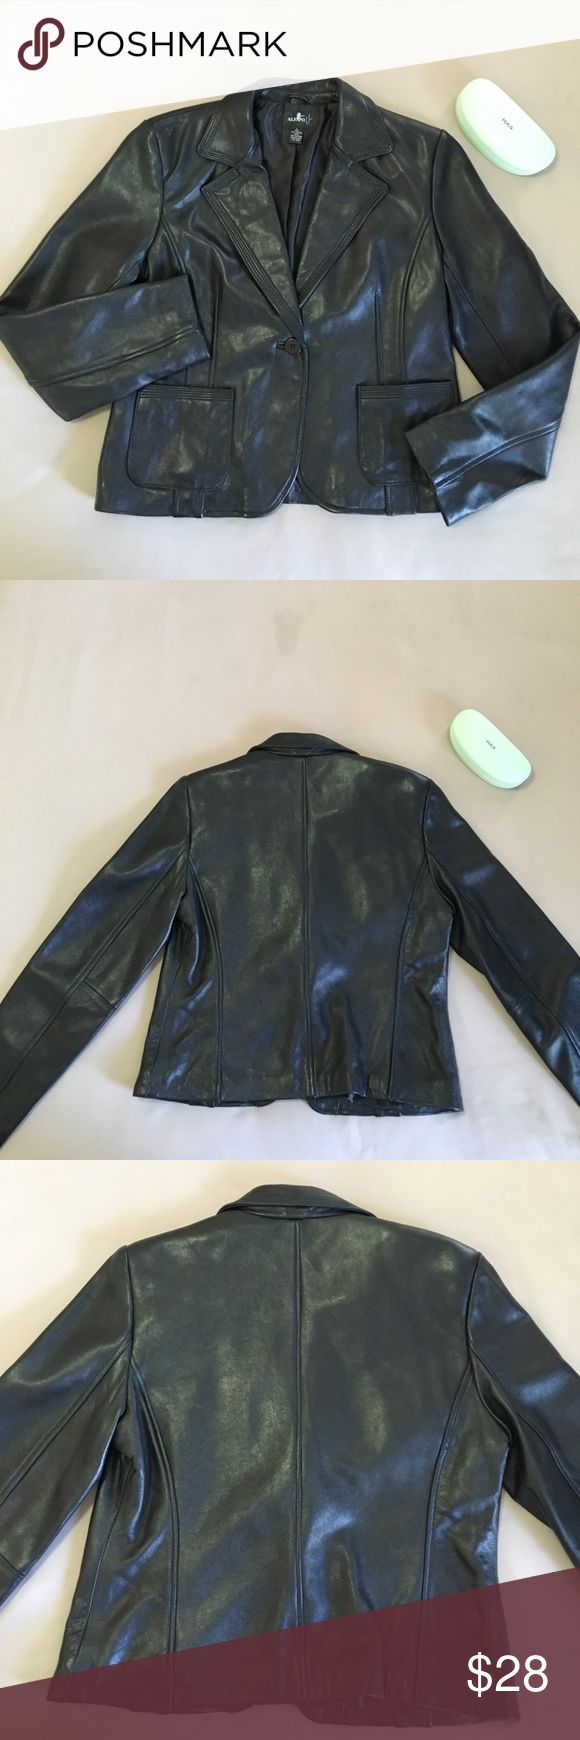 "‼️24 HRS SALE‼️ Alfani genuine leather jacket NWOT Beautiful Leather Cropped Fully Lined. 23"" long and 21"" armpit to armpit. Thx 💤👣💤 Alfani Jackets & Coats"